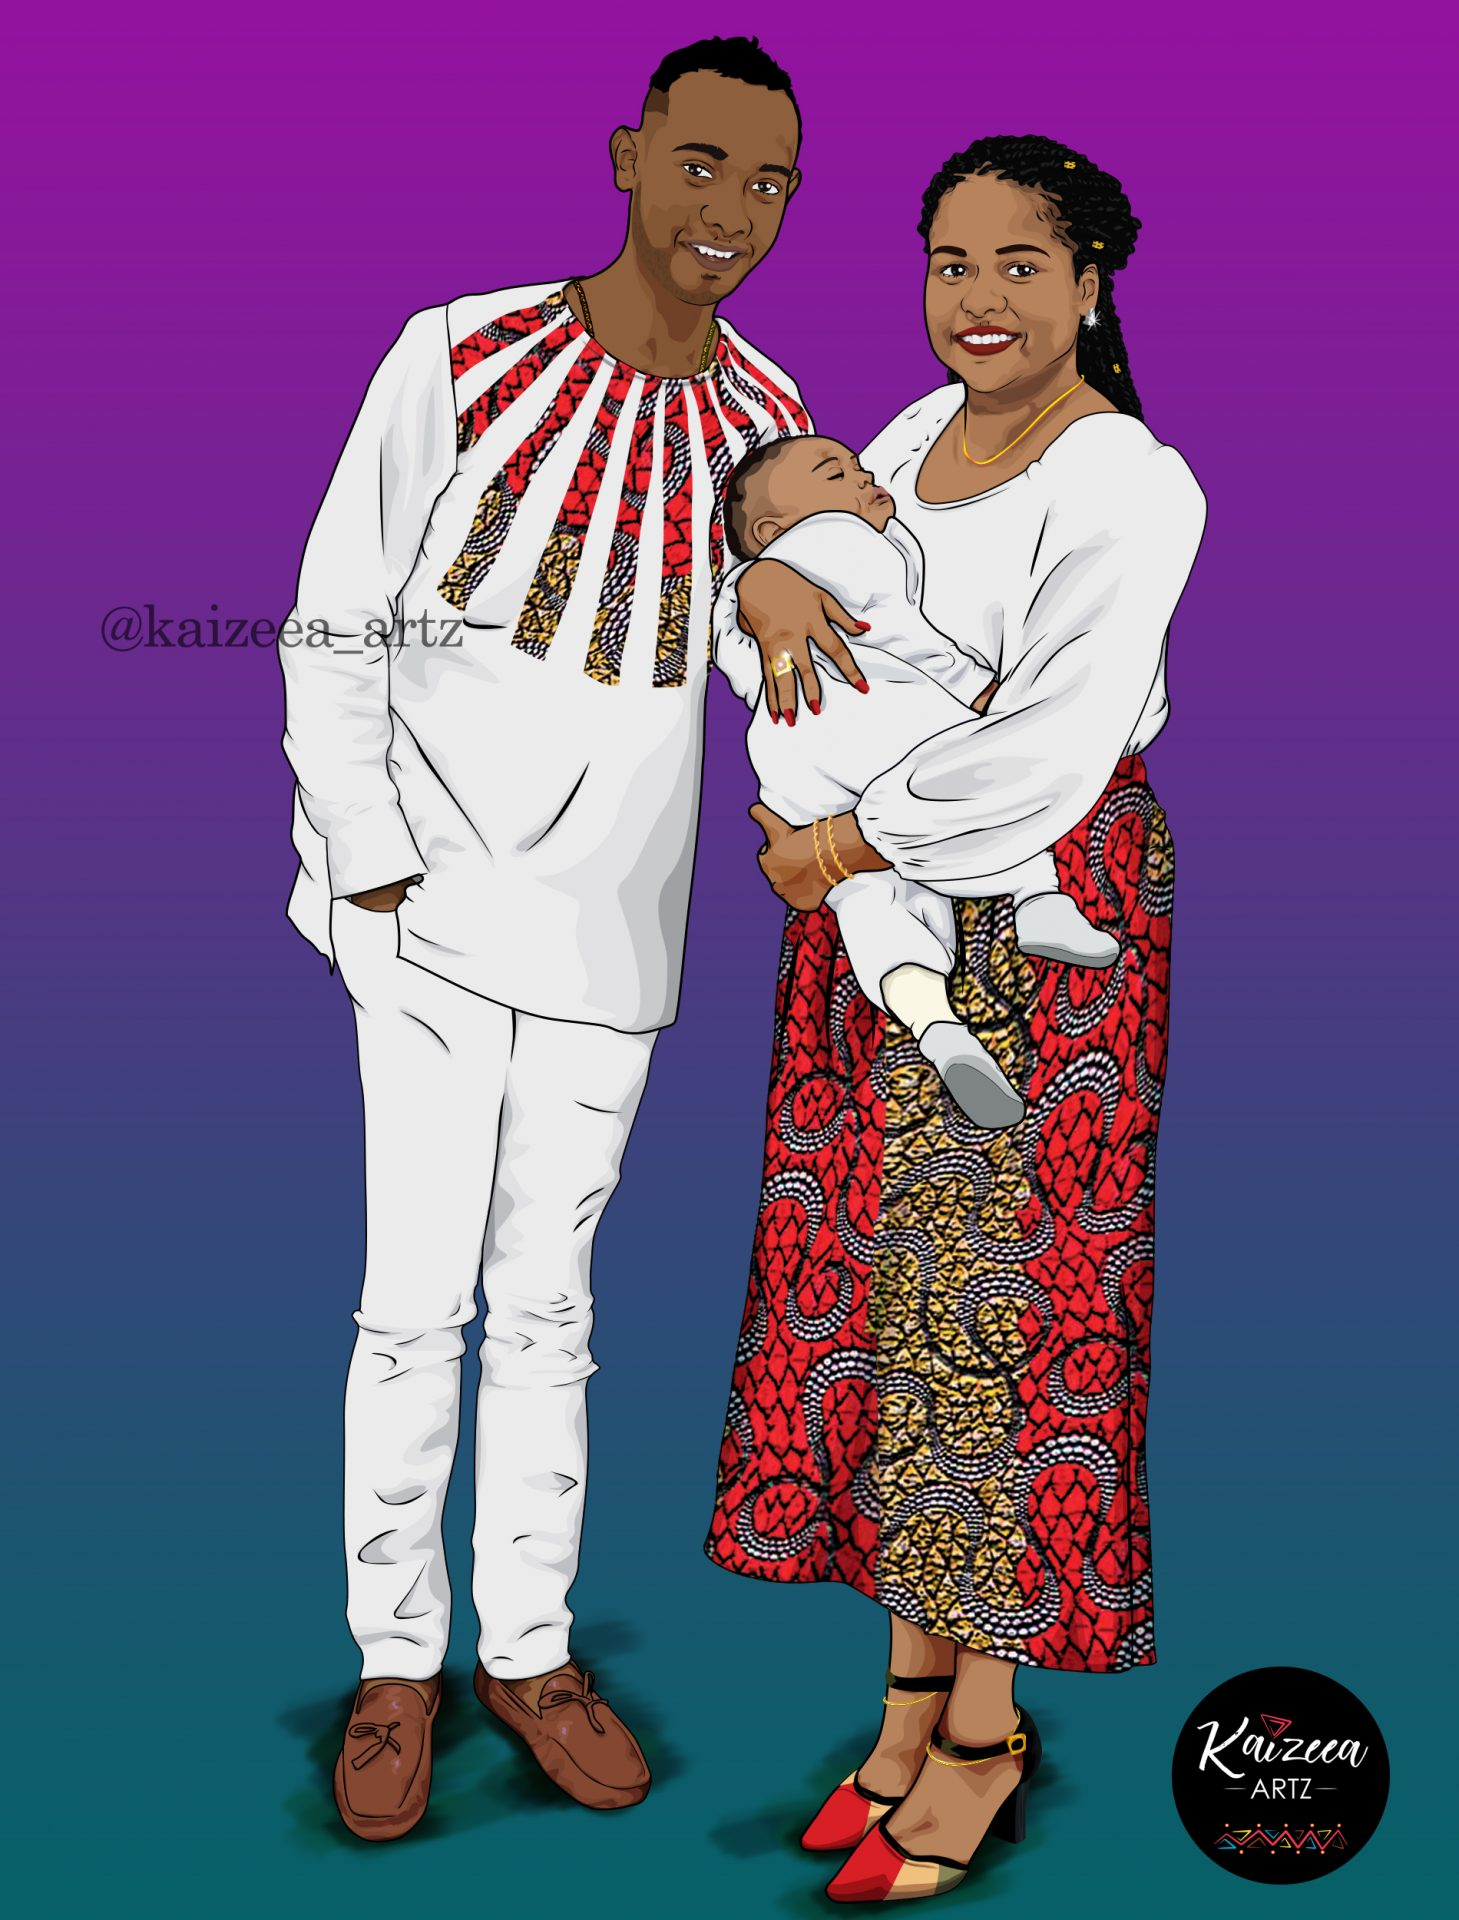 kaizeea_artz cartoonart mauritius mauritius waxfashion waxprints maxiskirt royalfamily africas fashion baby africanart shoes stiletto blackbusinesswomen artrepreneur afropreneur colorful toddler baby digitalart digitalartist prints pattern